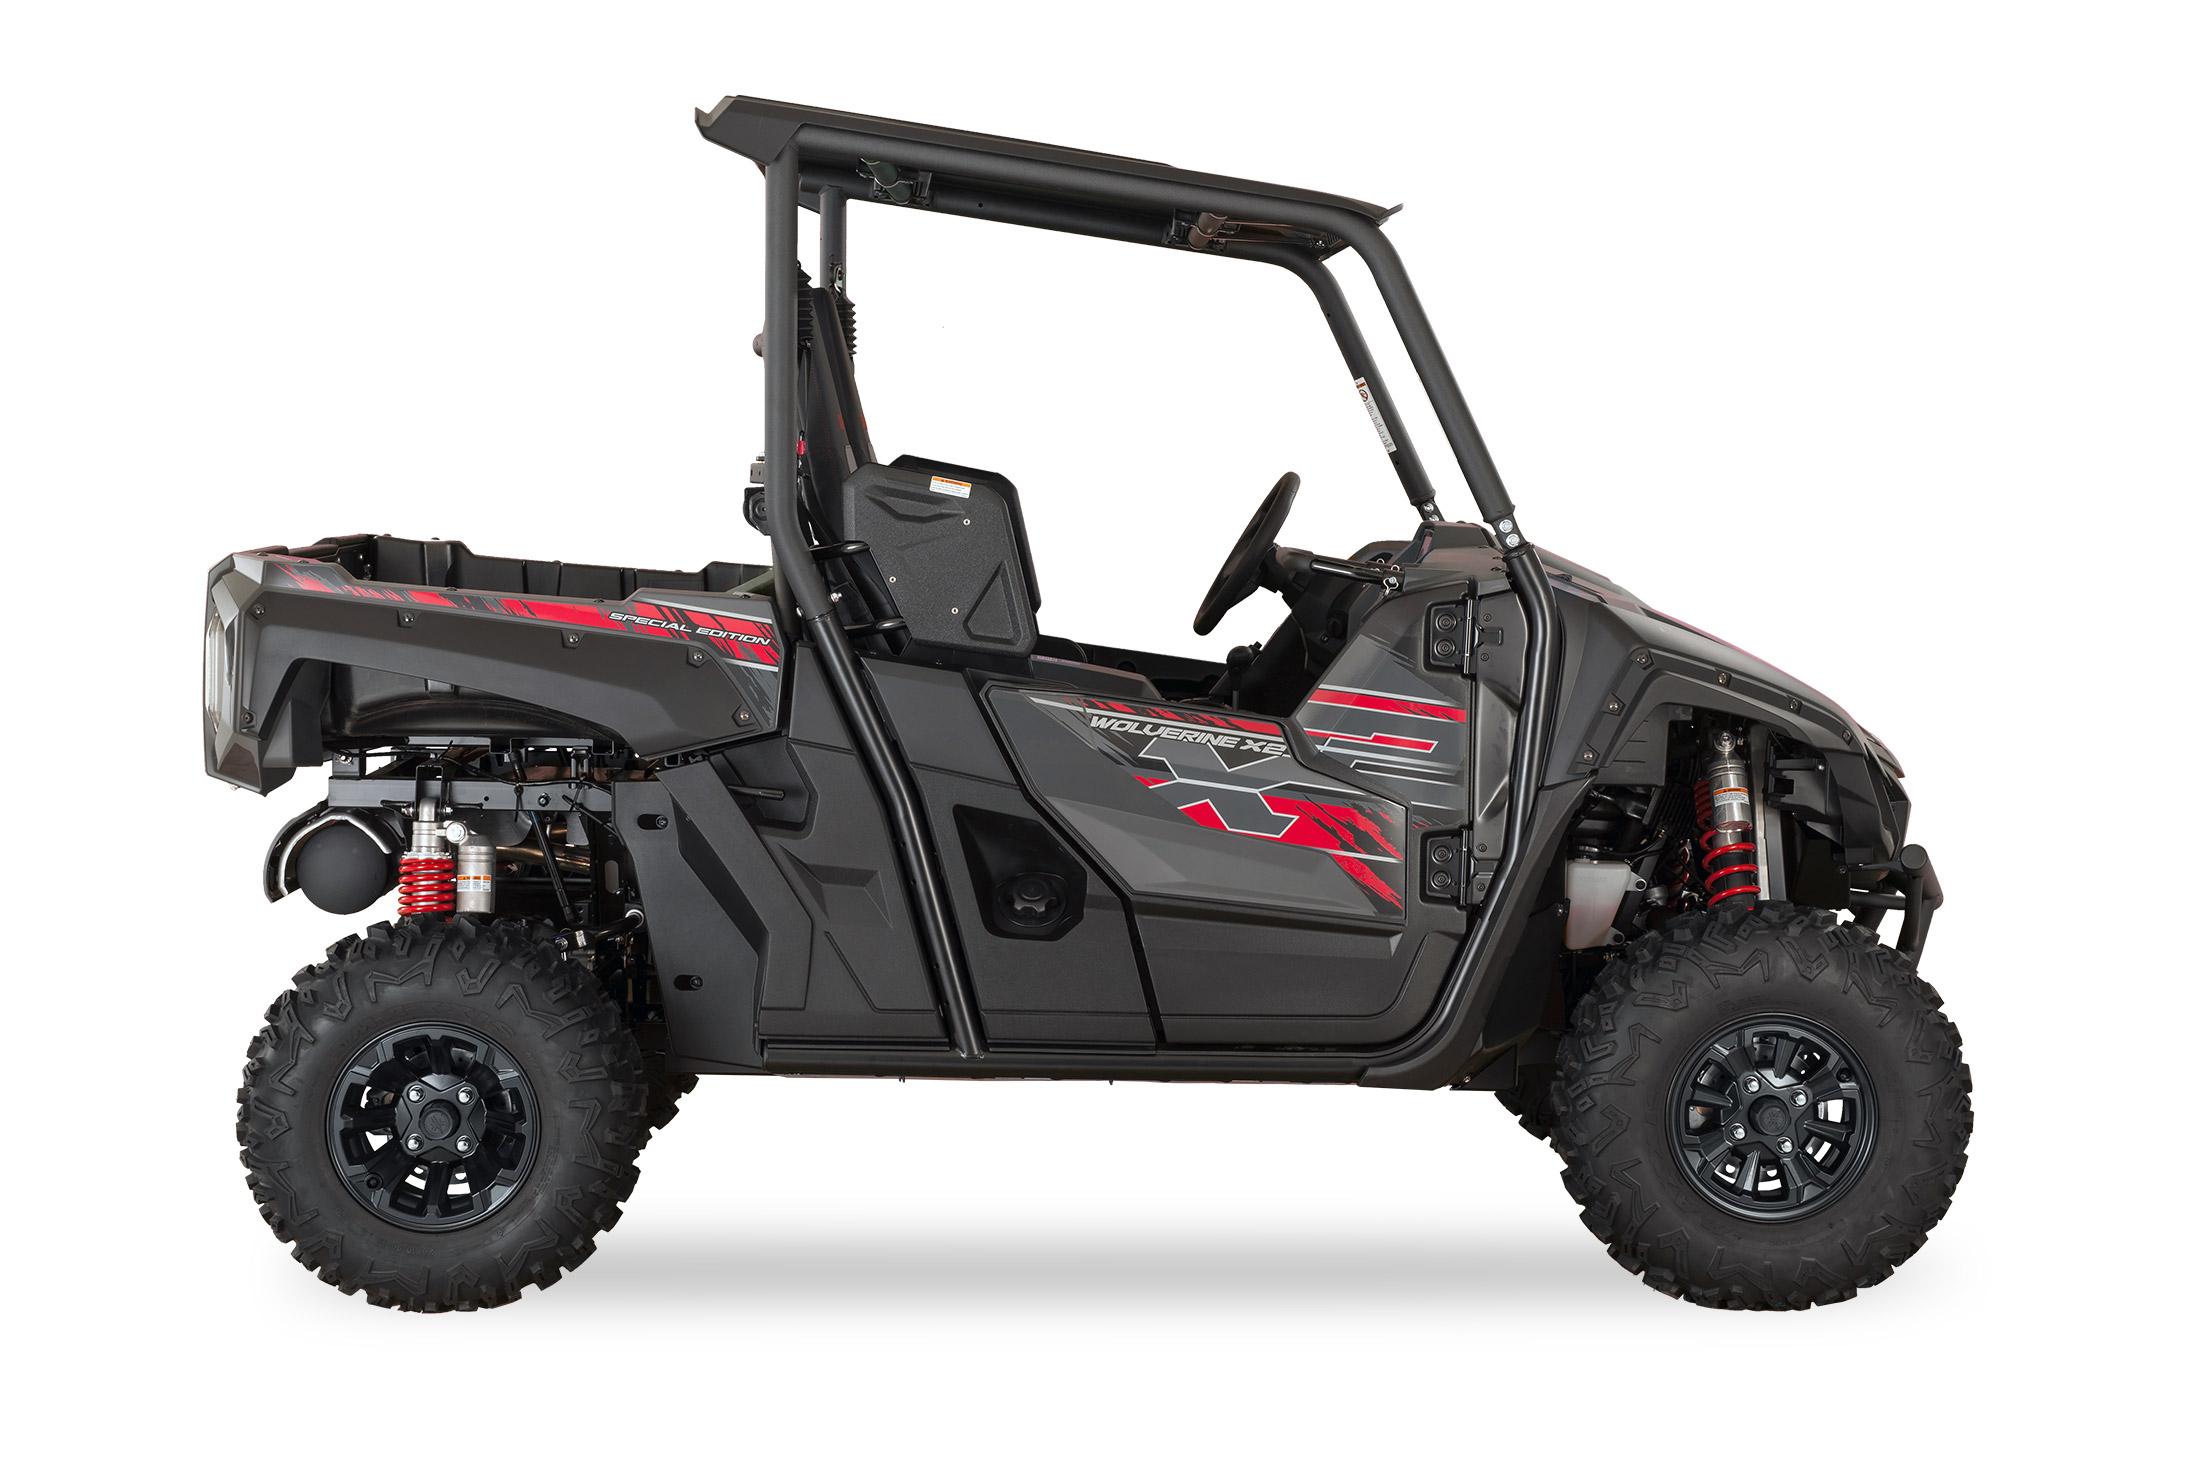 2019 Yamaha Wolverine X2 R Spec Se Recreation Side By Side